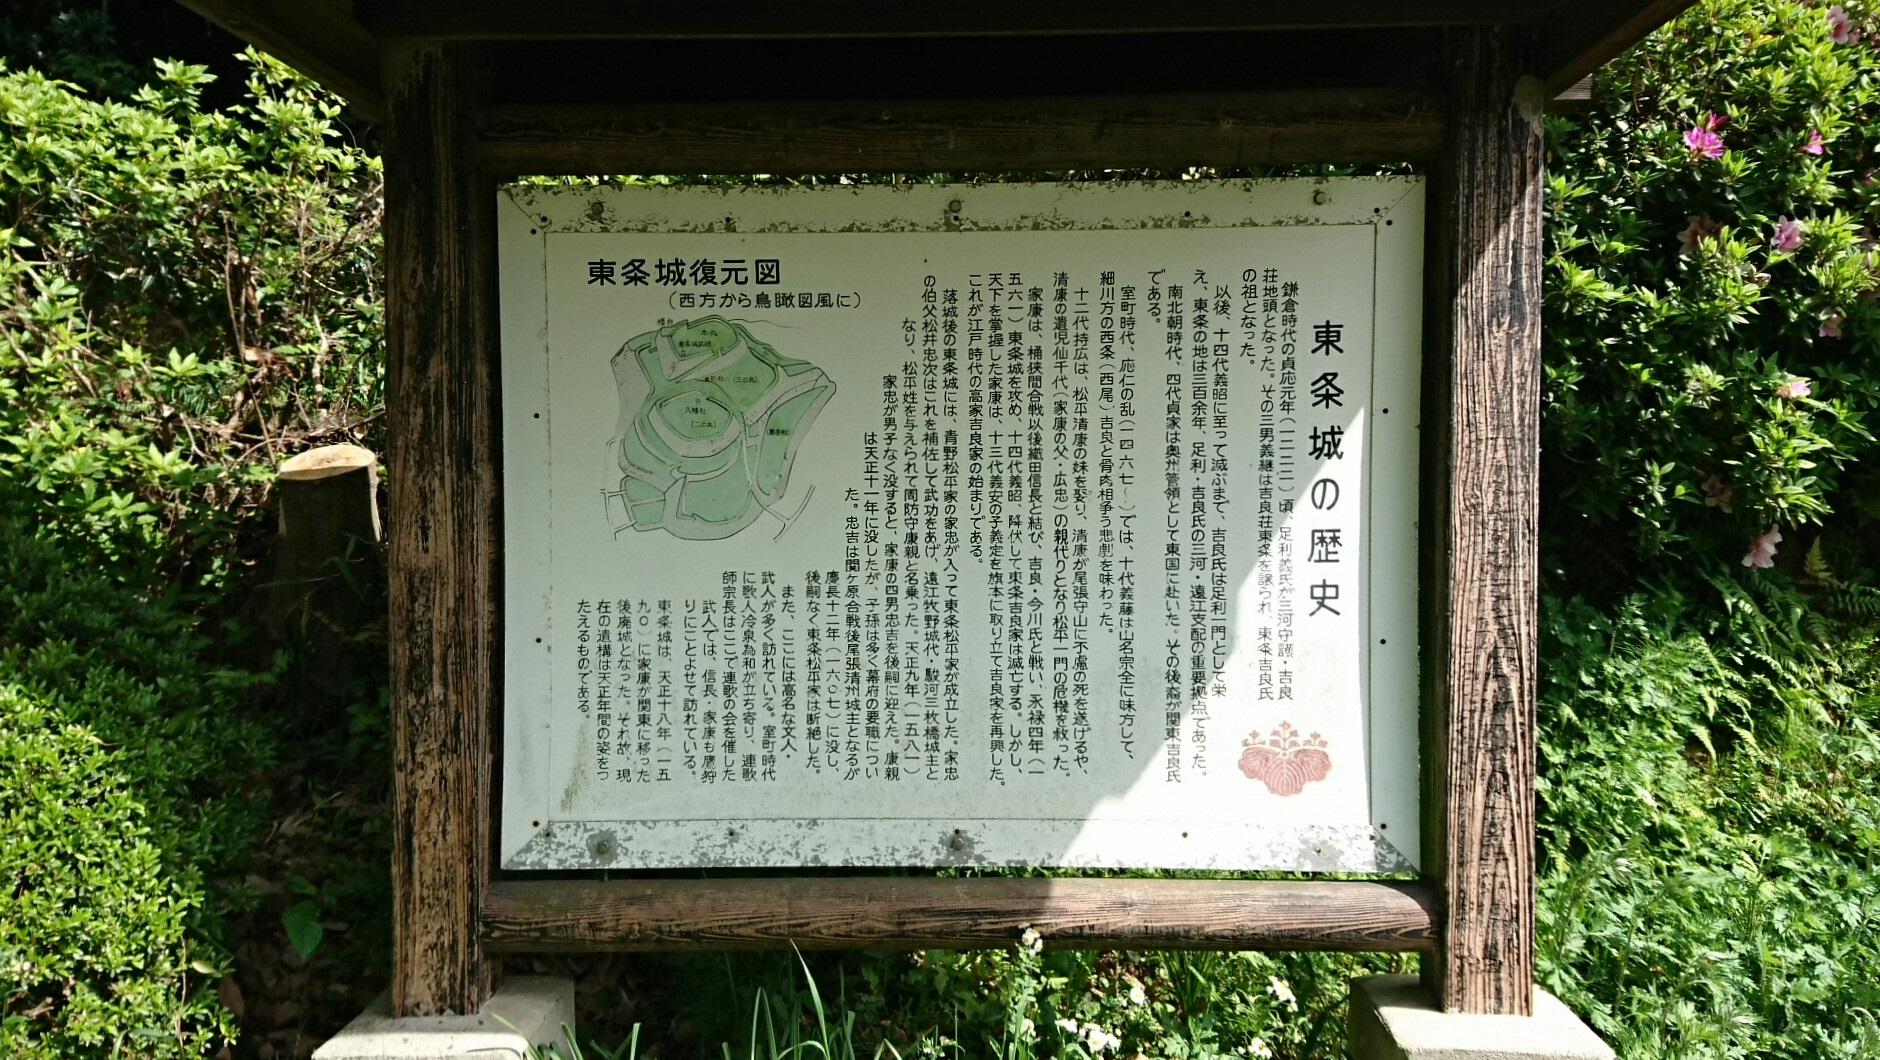 2017.5.2 東条城 (4) 「東条城の歴史」 1880-1060